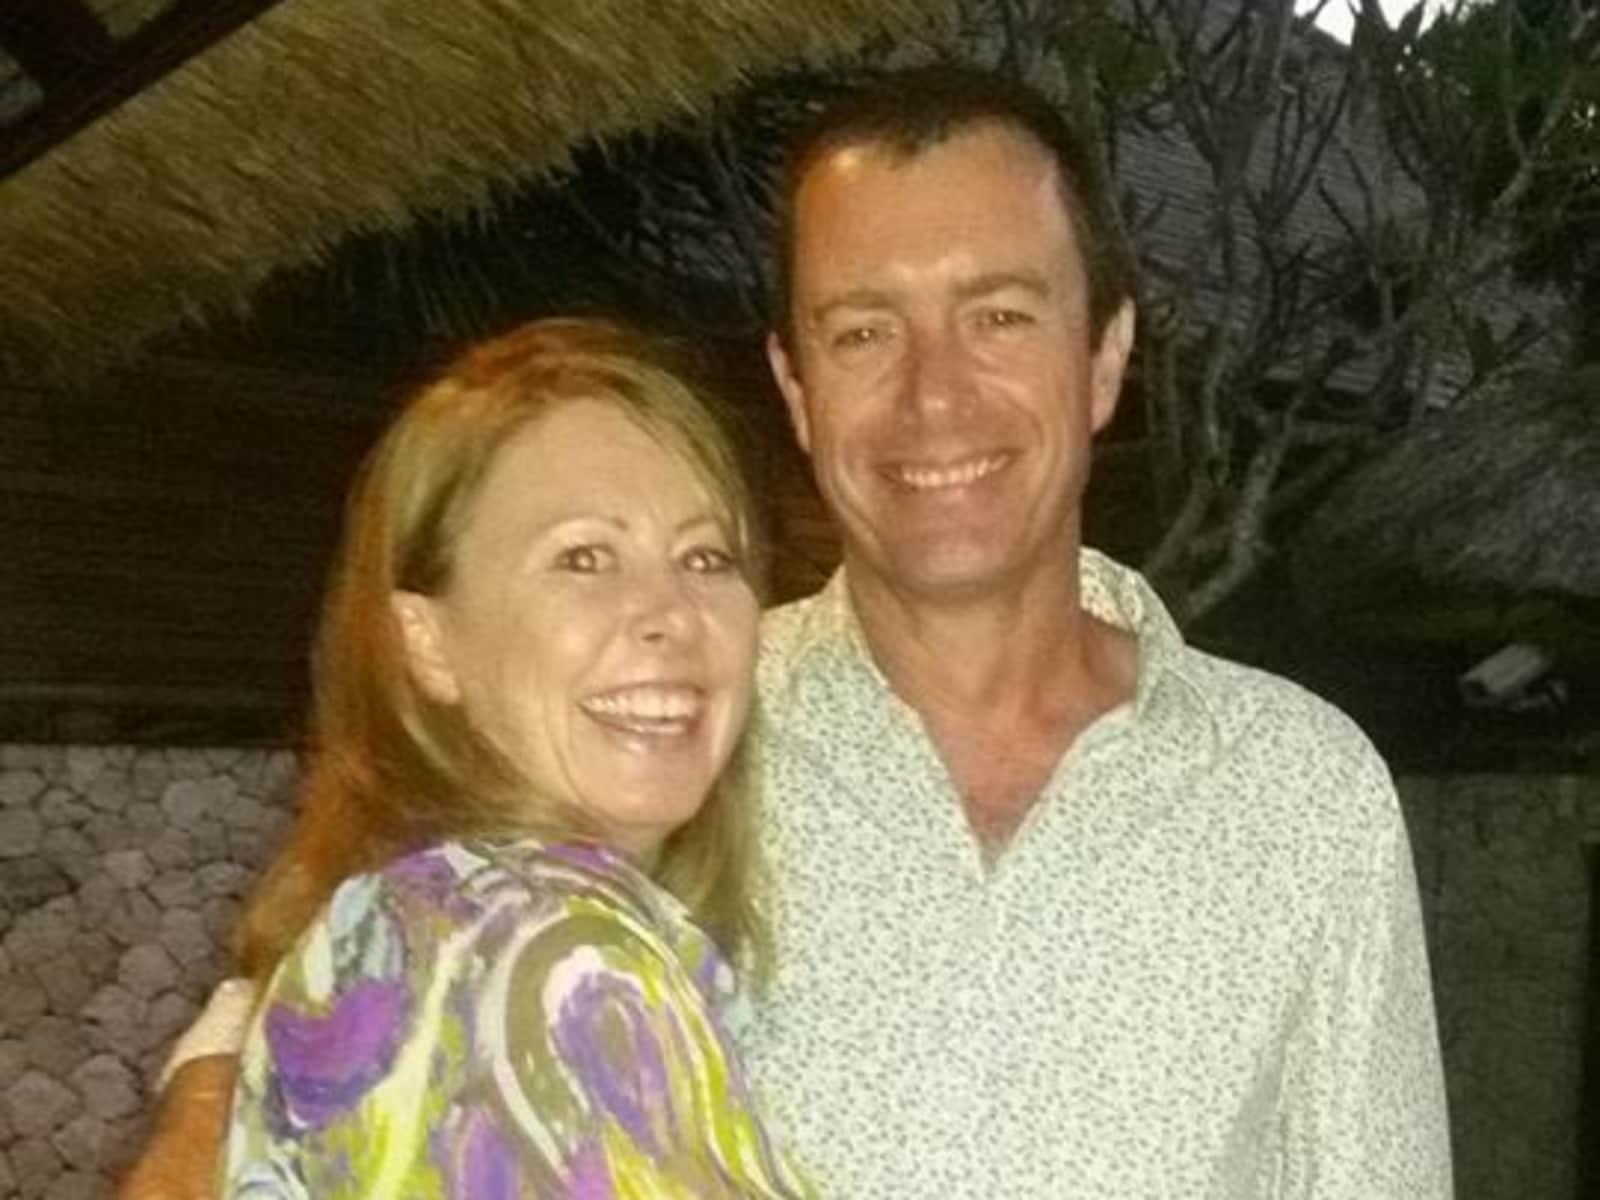 Jennifer & Mark from Perth, Western Australia, Australia